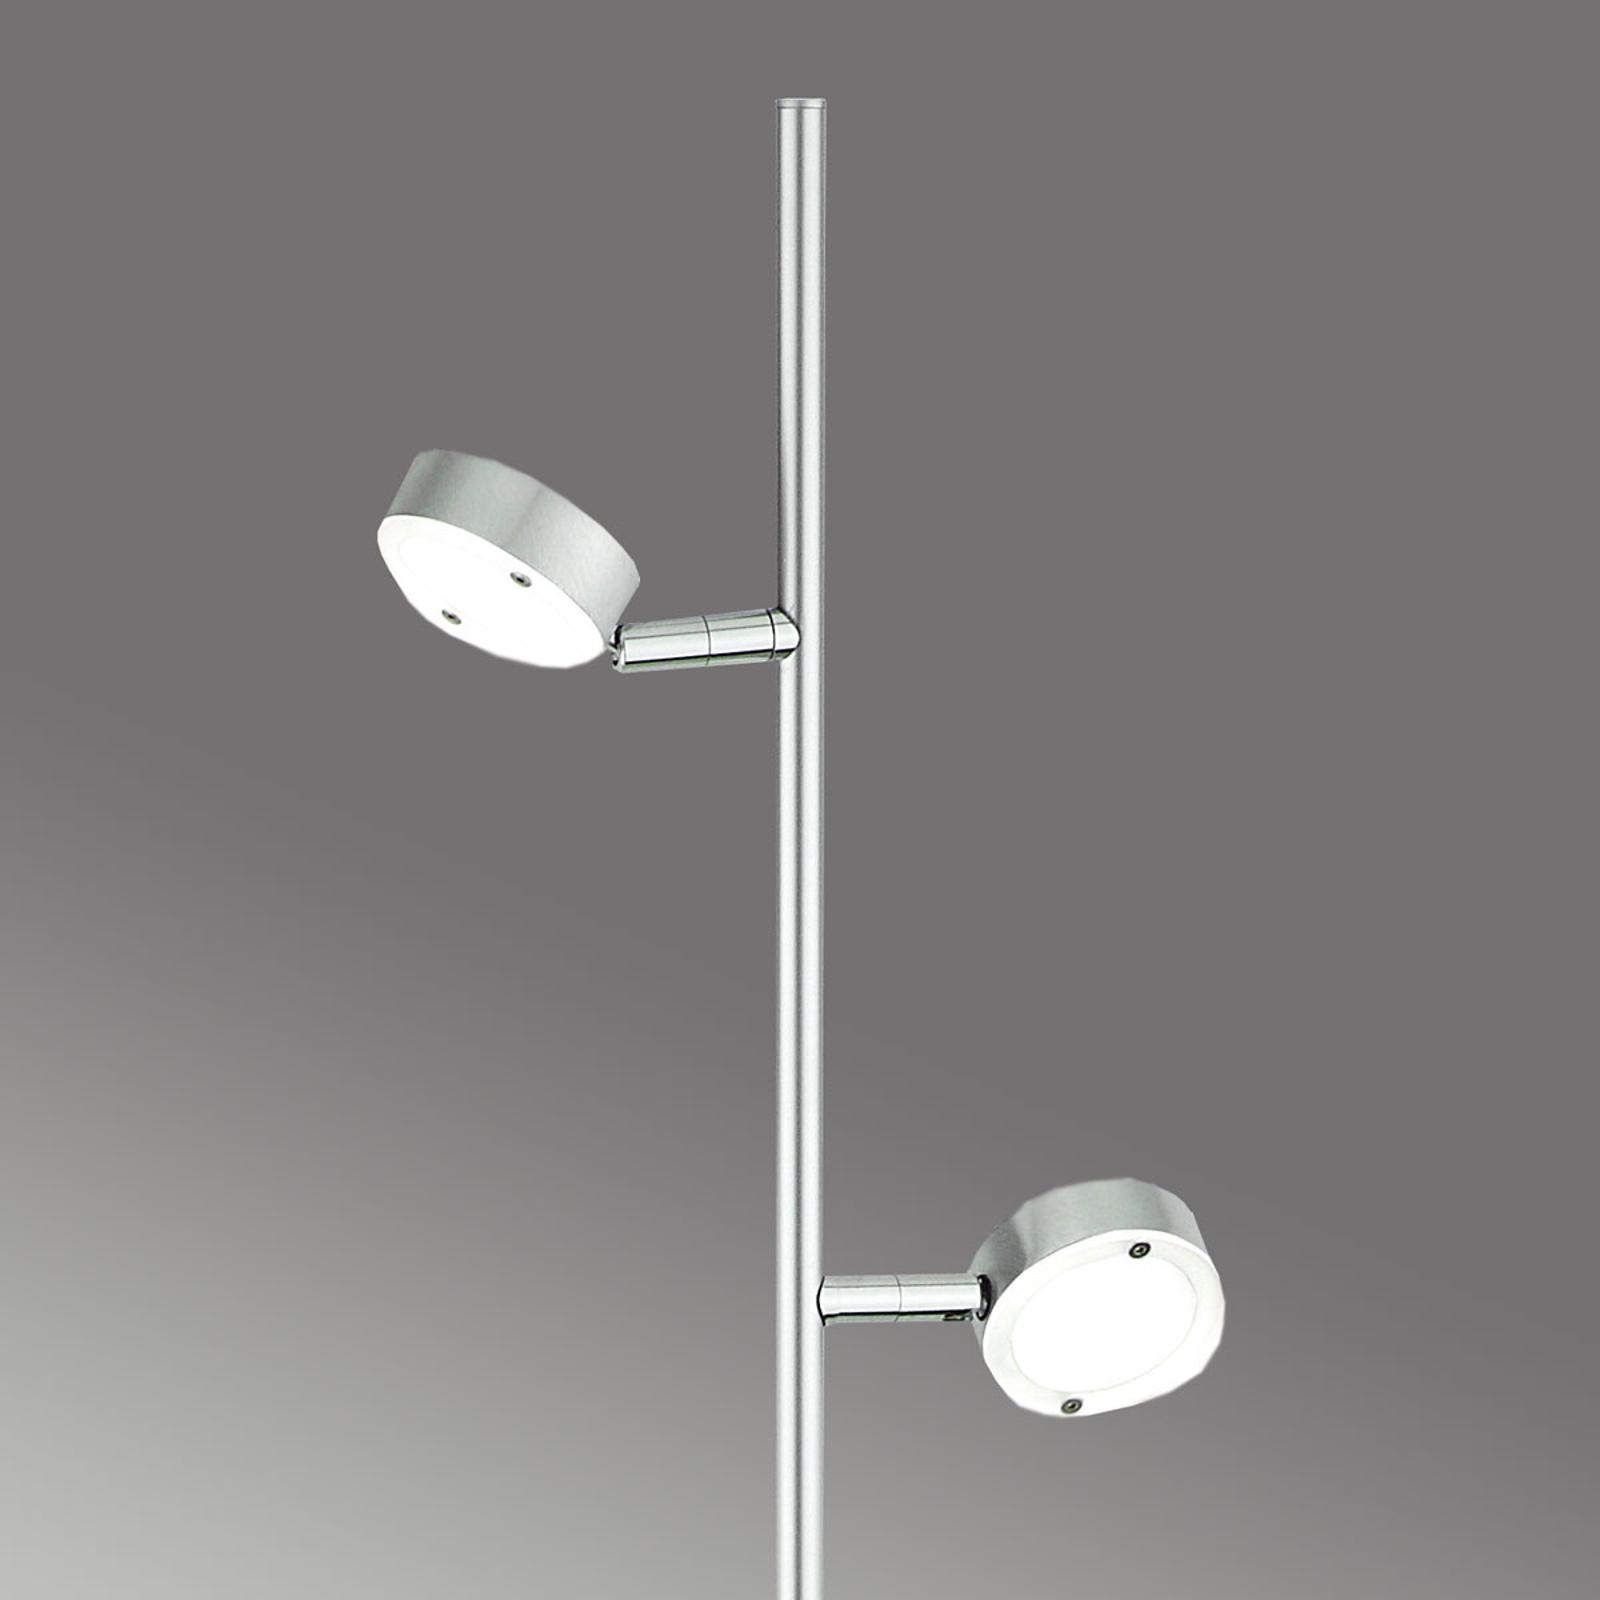 Minimalistisk LED-gulvlampe SATURN, 2 lyskilder